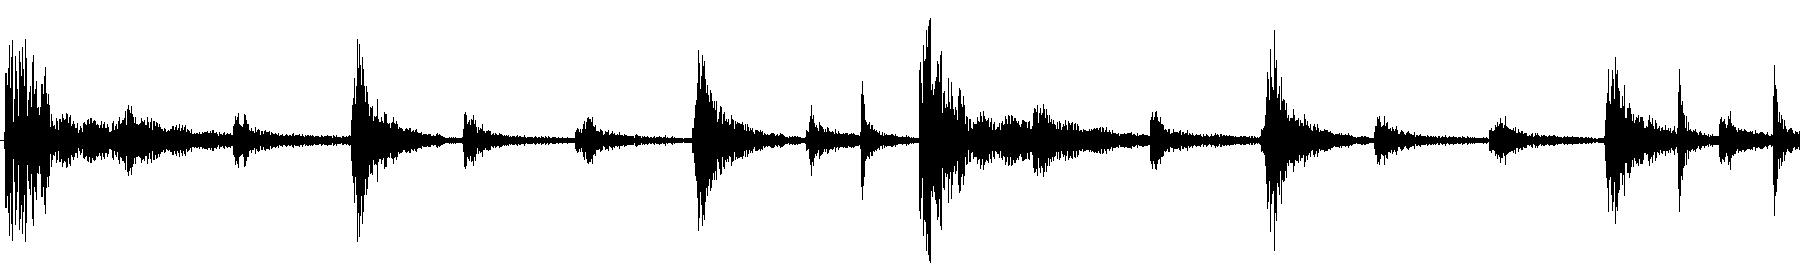 arab percussion loop 19